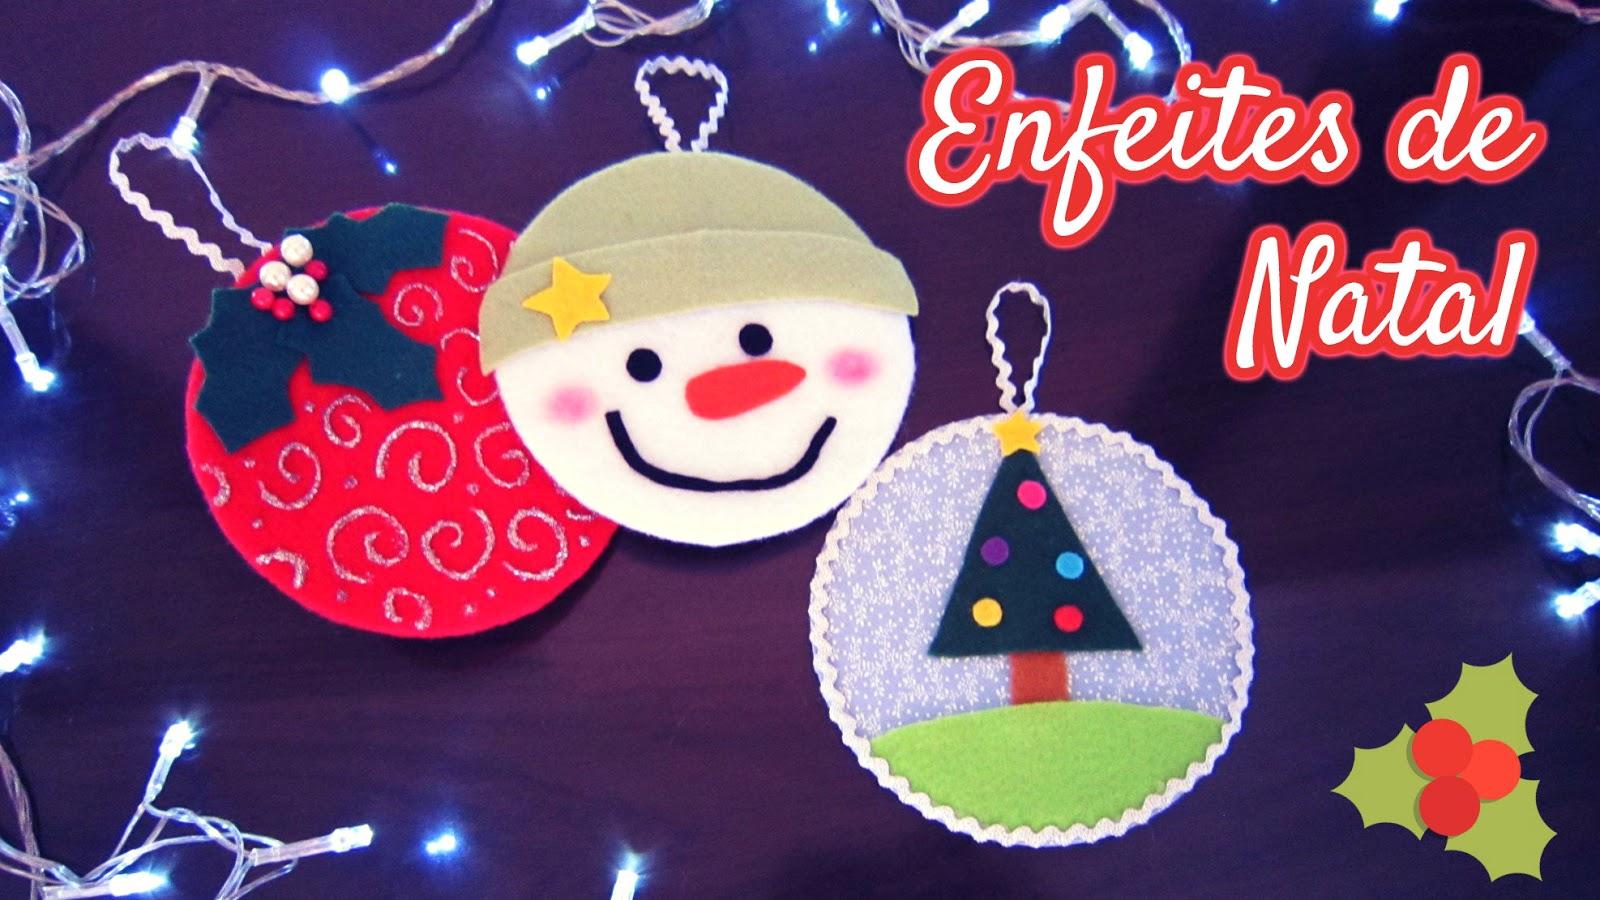 Armario Oficina Puerta Persiana ~ Knanda Artes Como fazer Enfeites de Natal Artesanato com CD